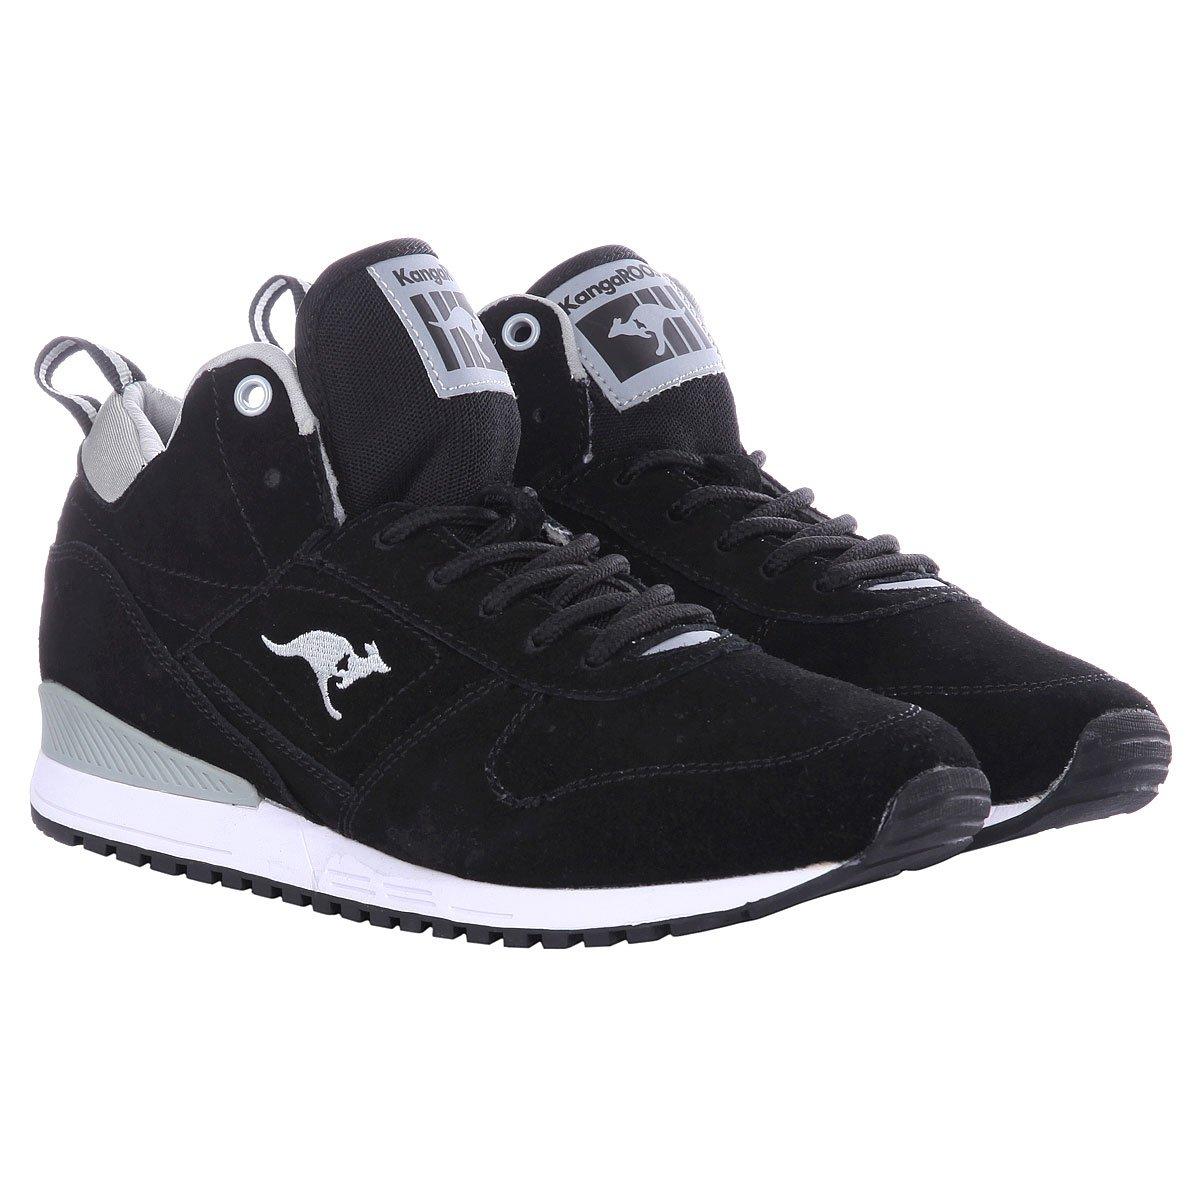 7aa9ebb7 Купить кроссовки Kangaroos Frenzy Roos Black/Semi Grey в интернет ...